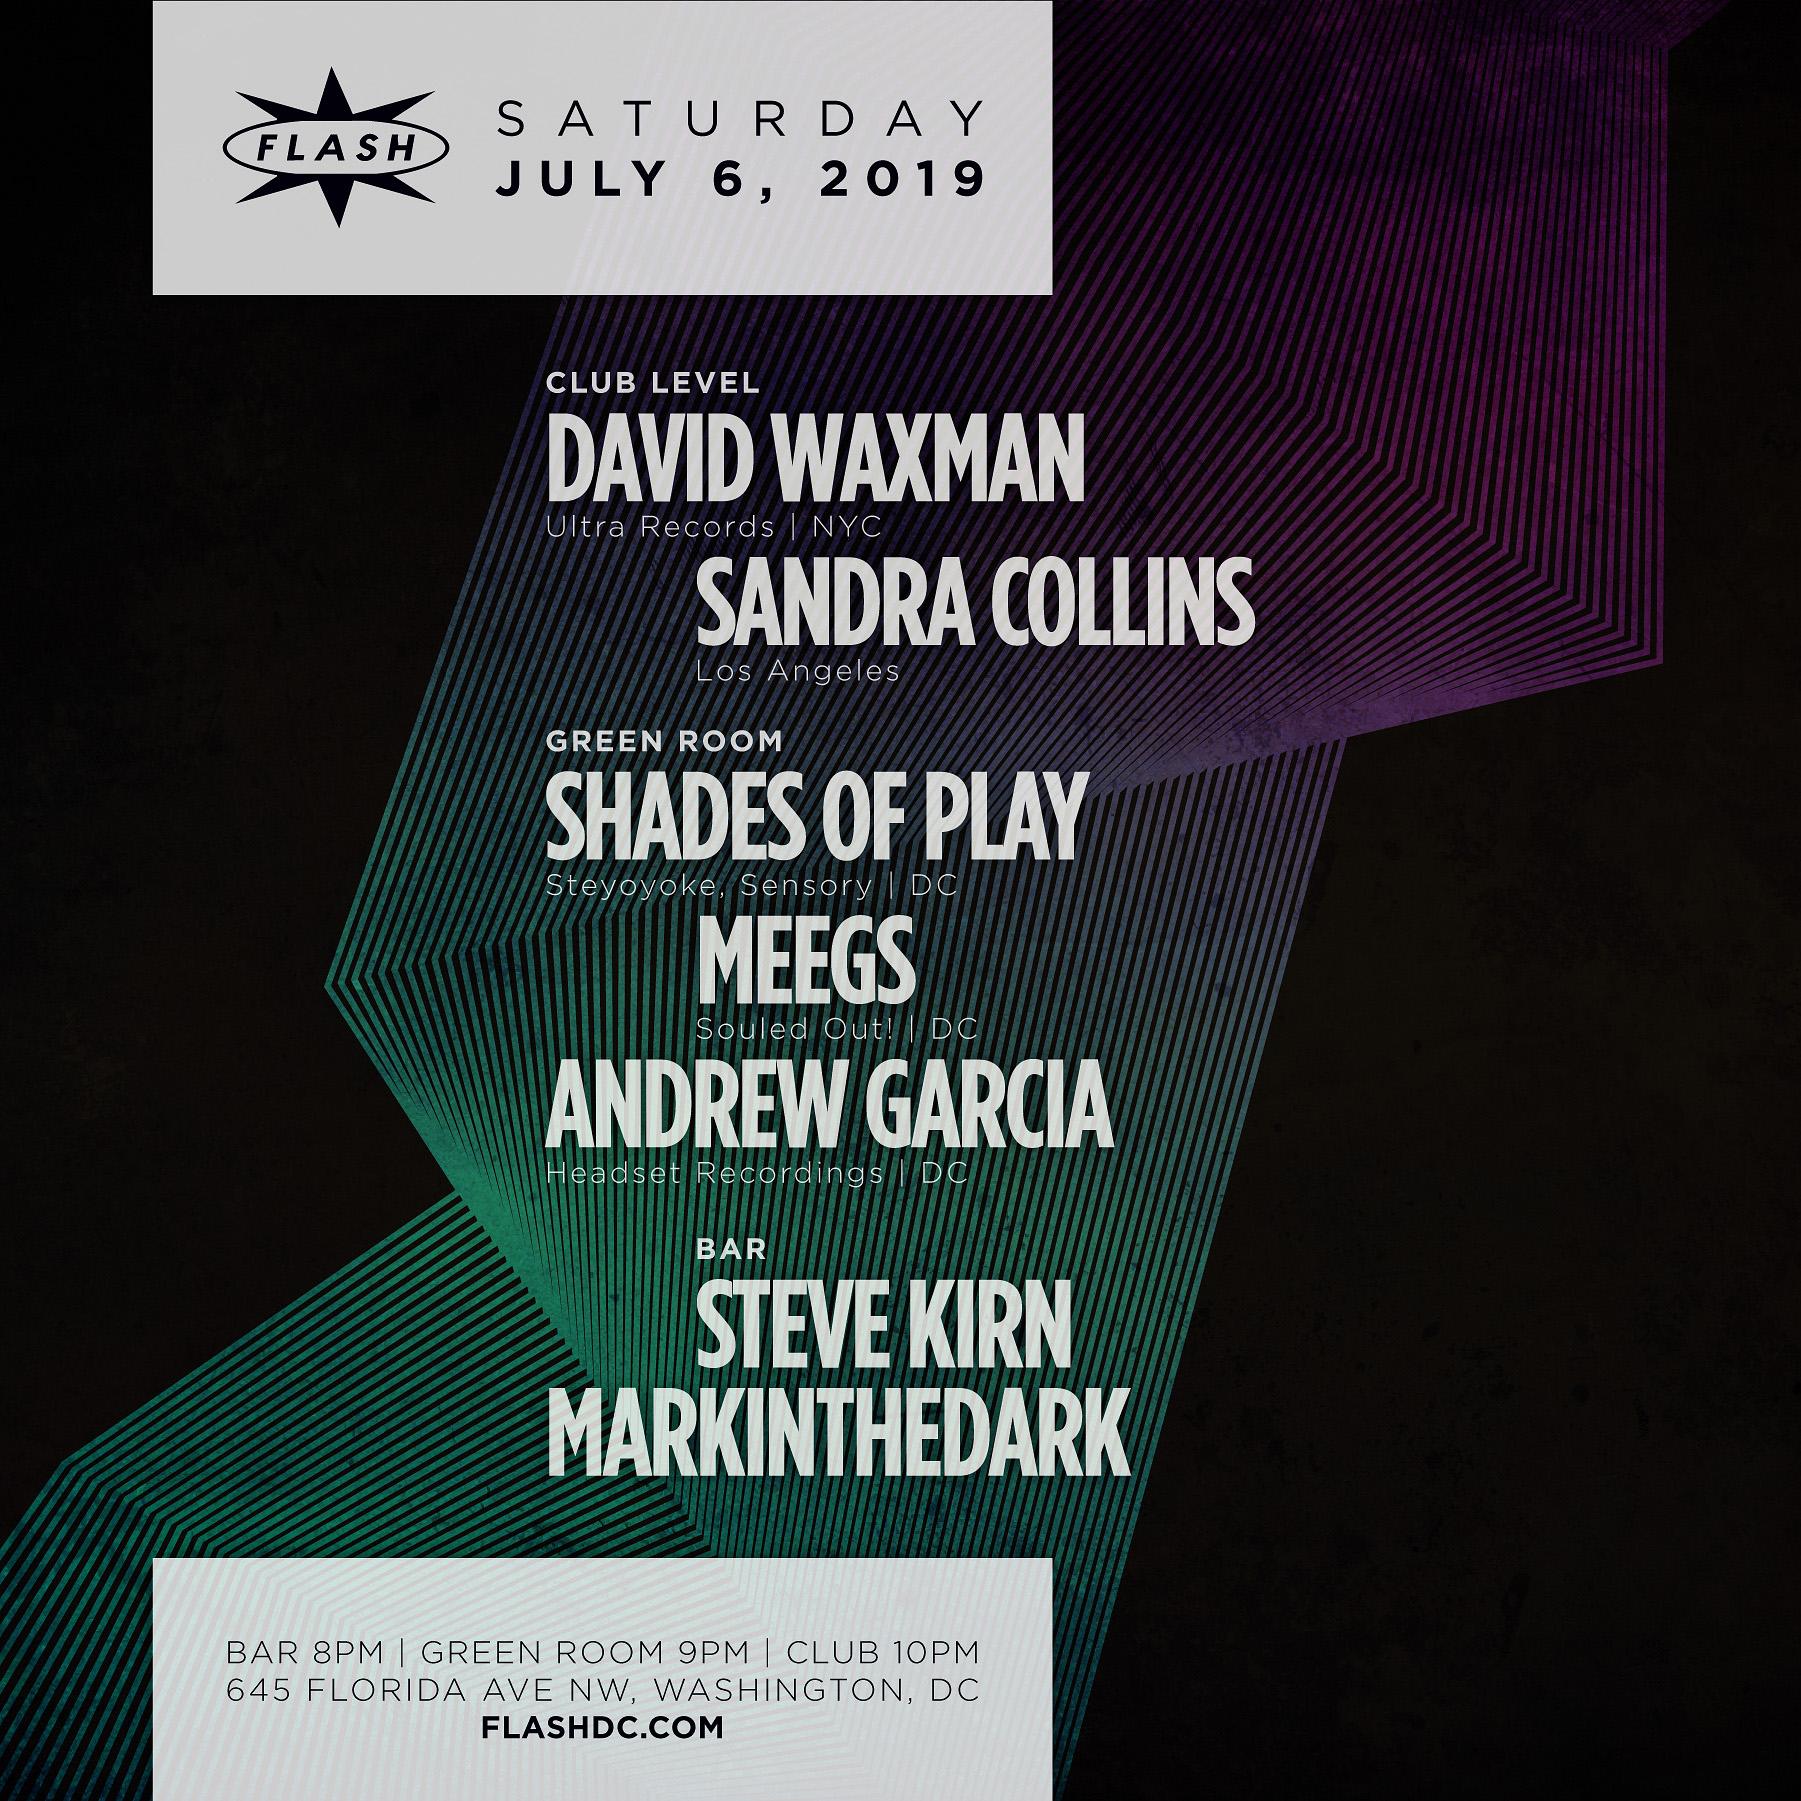 David Waxman - Sandra Collins - Steve Kirn - markintheDark event thumbnail